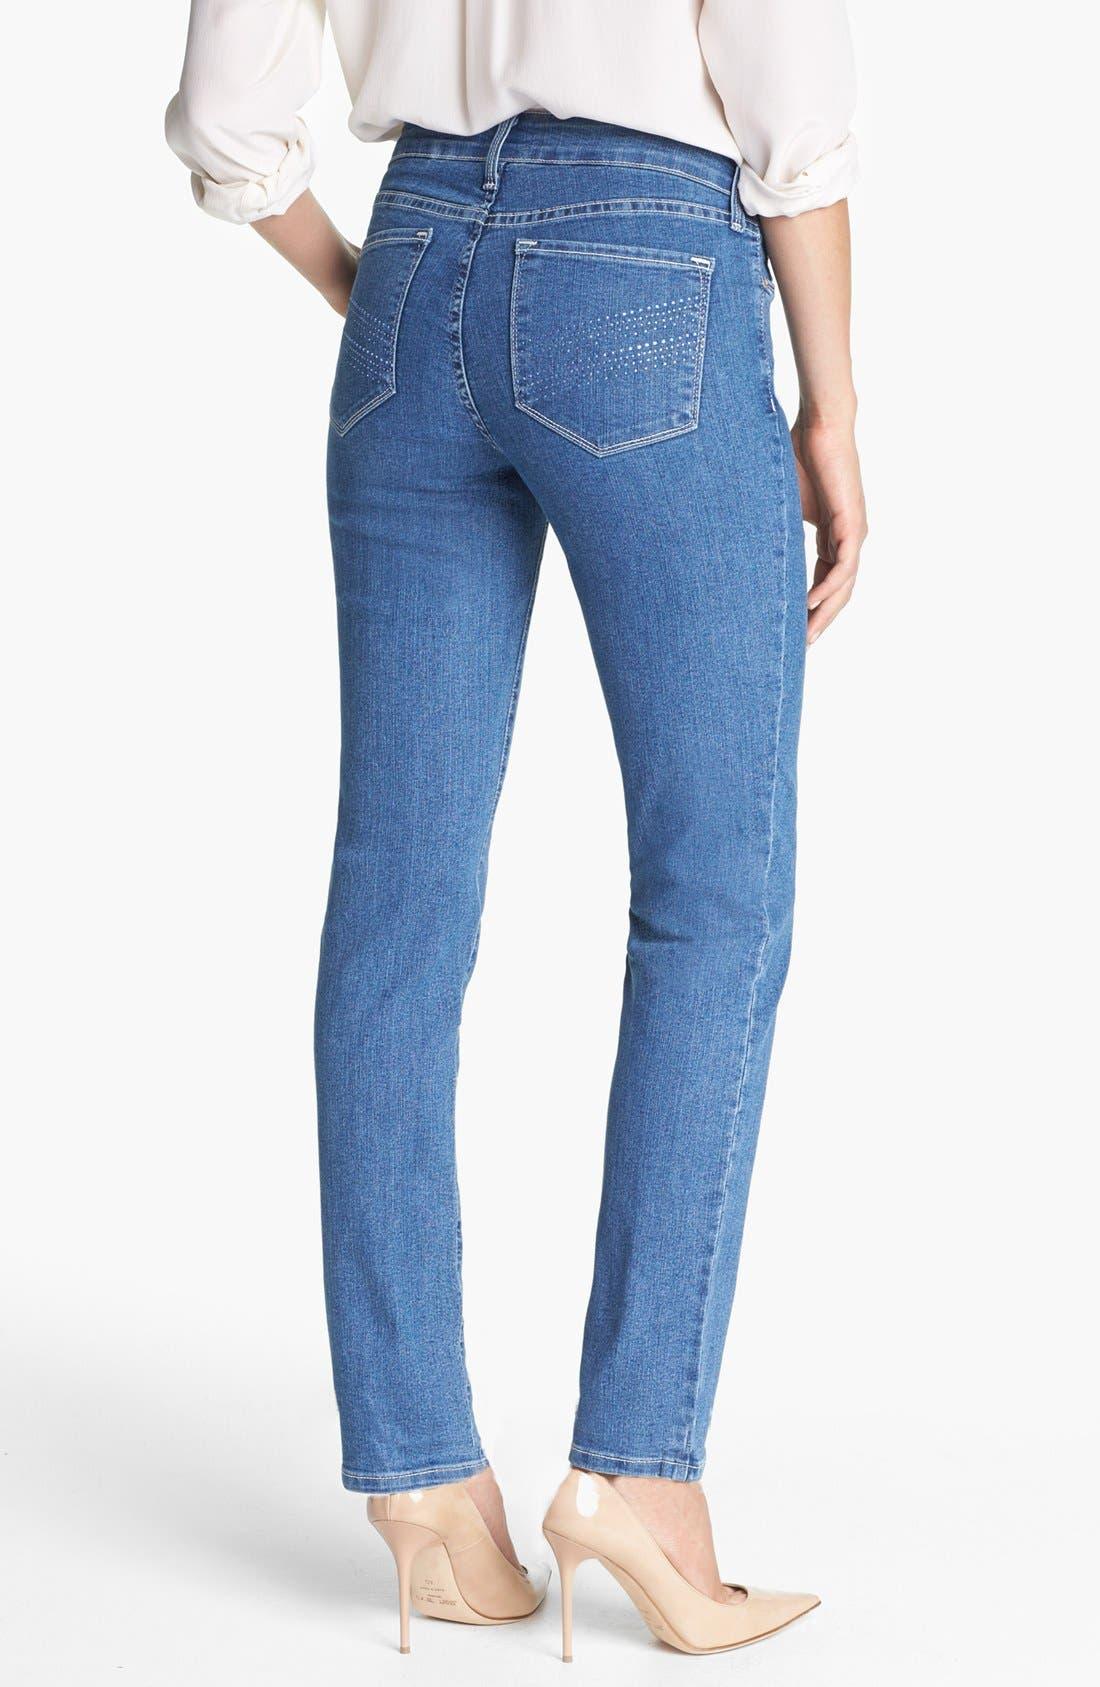 Alternate Image 3  - NYDJ 'Sheri' Embellished Pocket Stretch Skinny Jeans (Maryland)